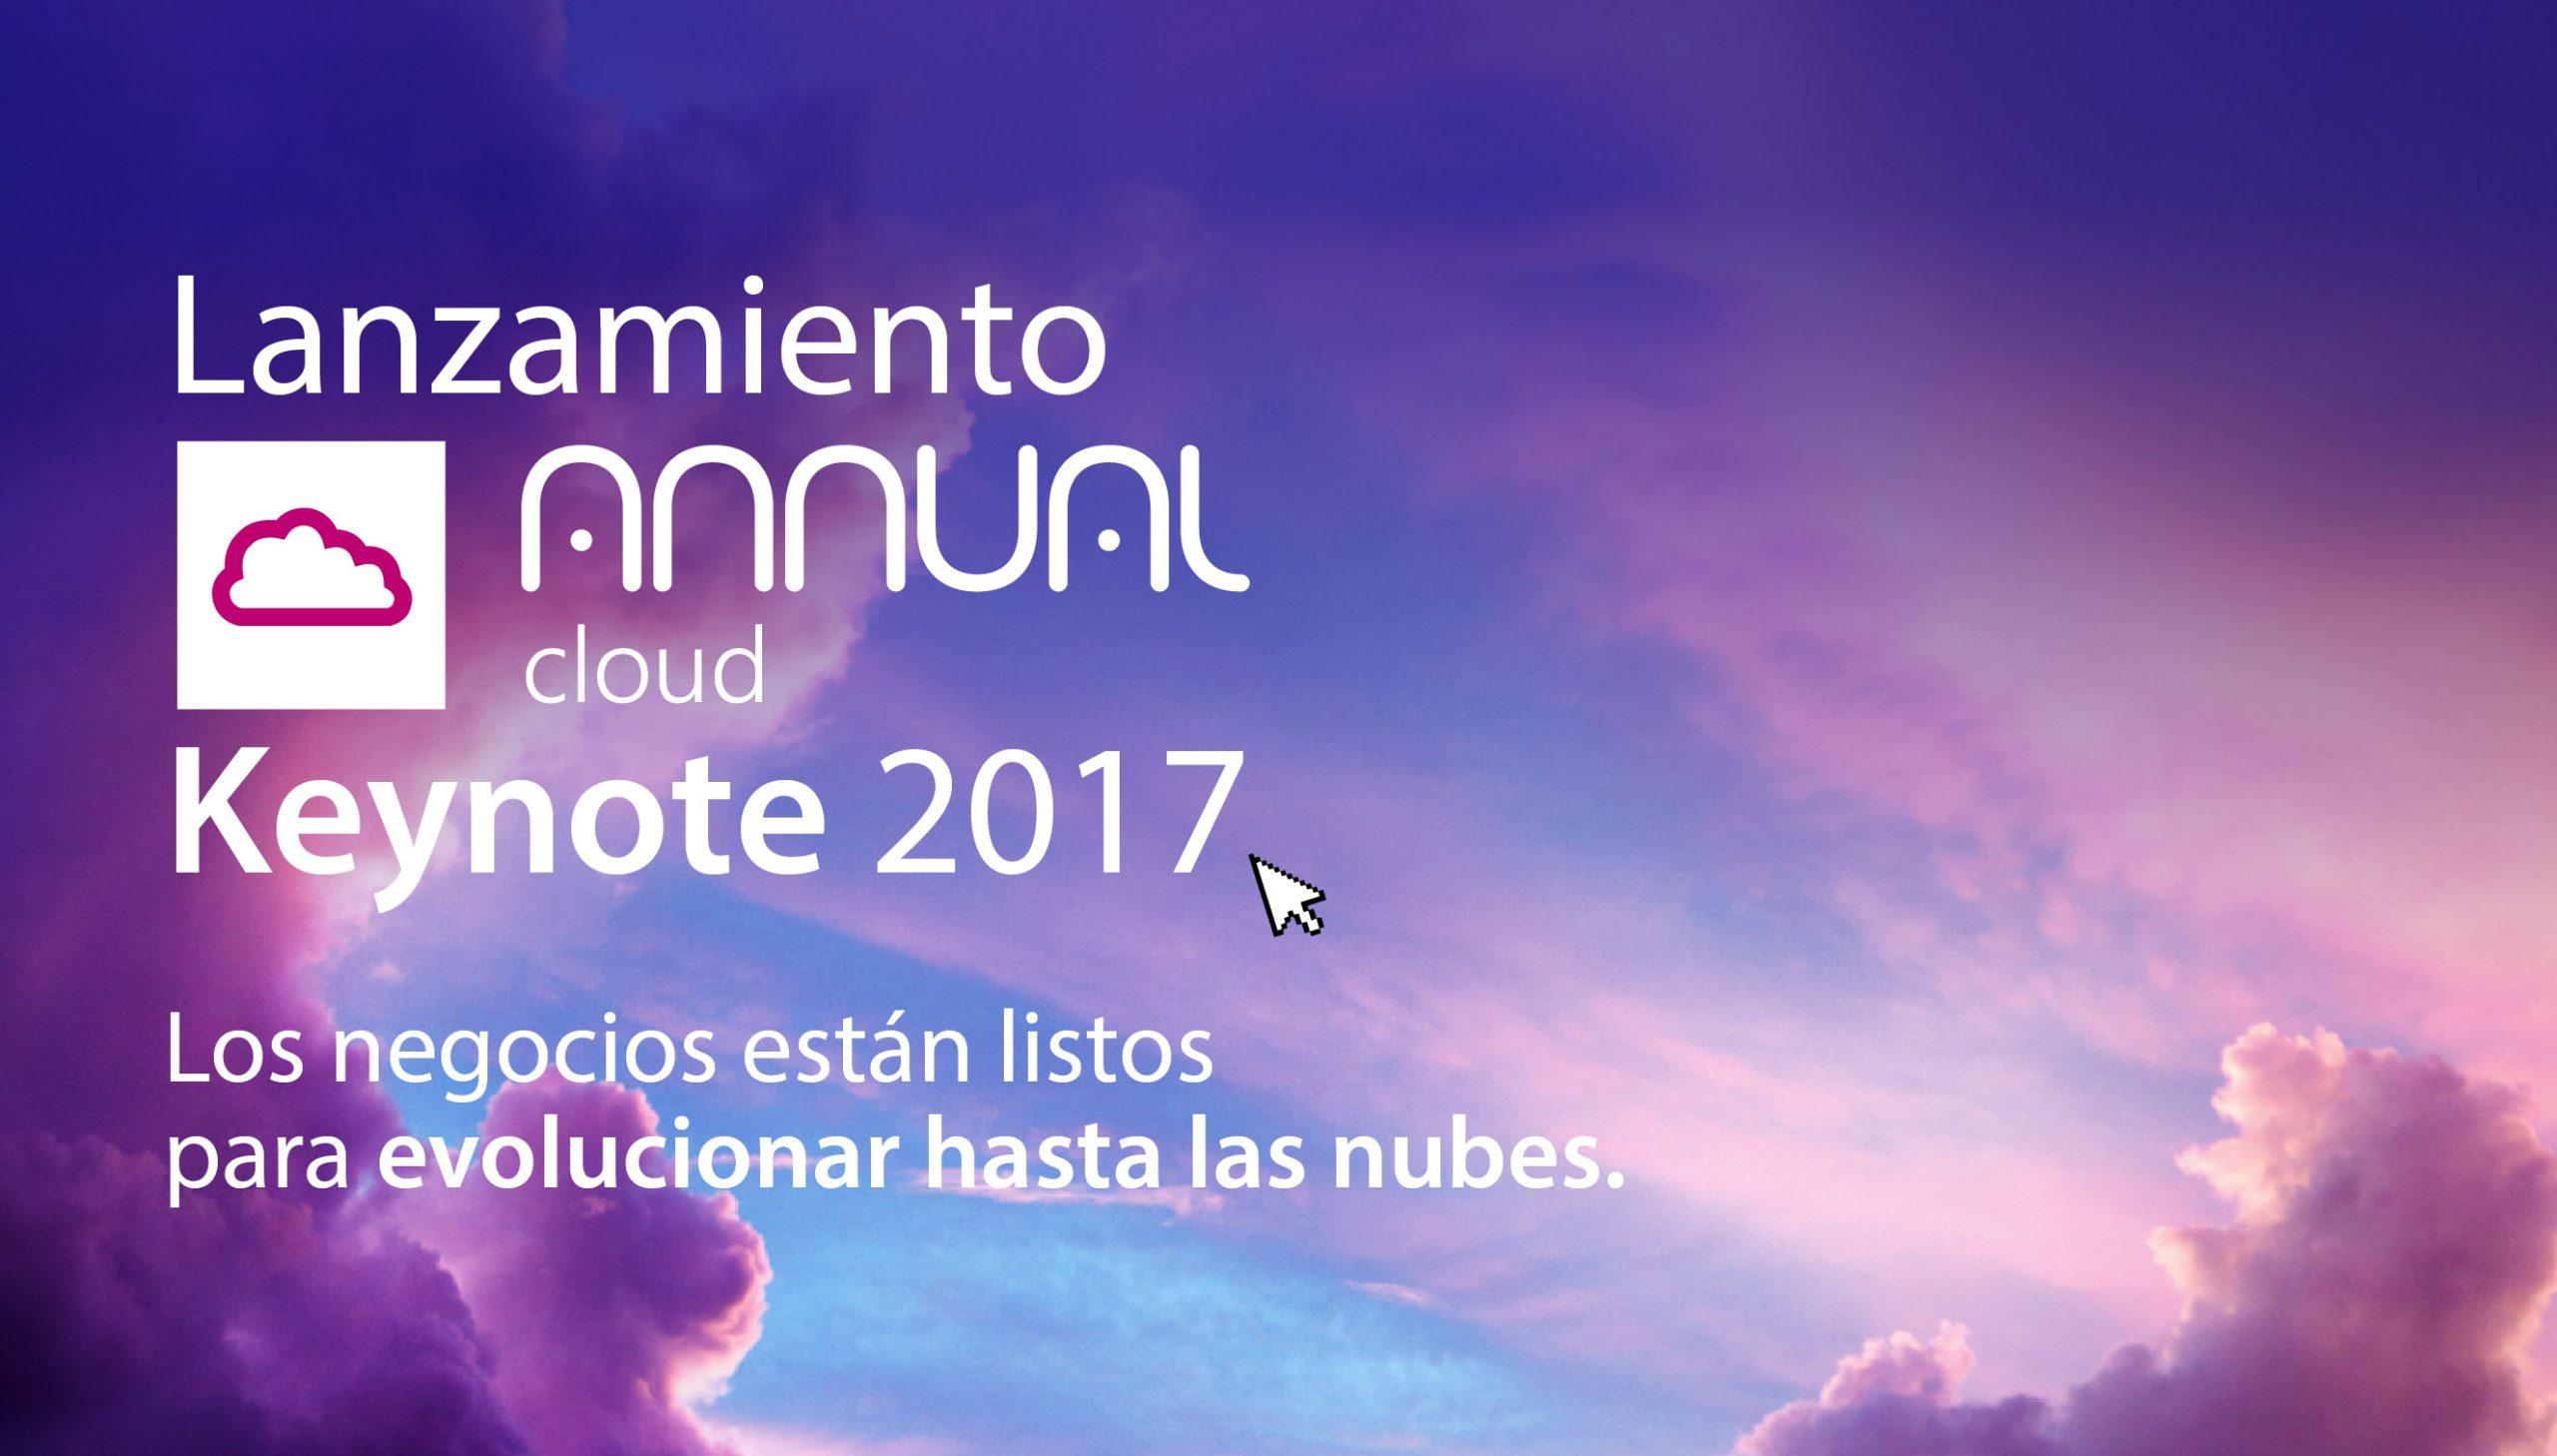 Keynote 2017 Annual Cloud.